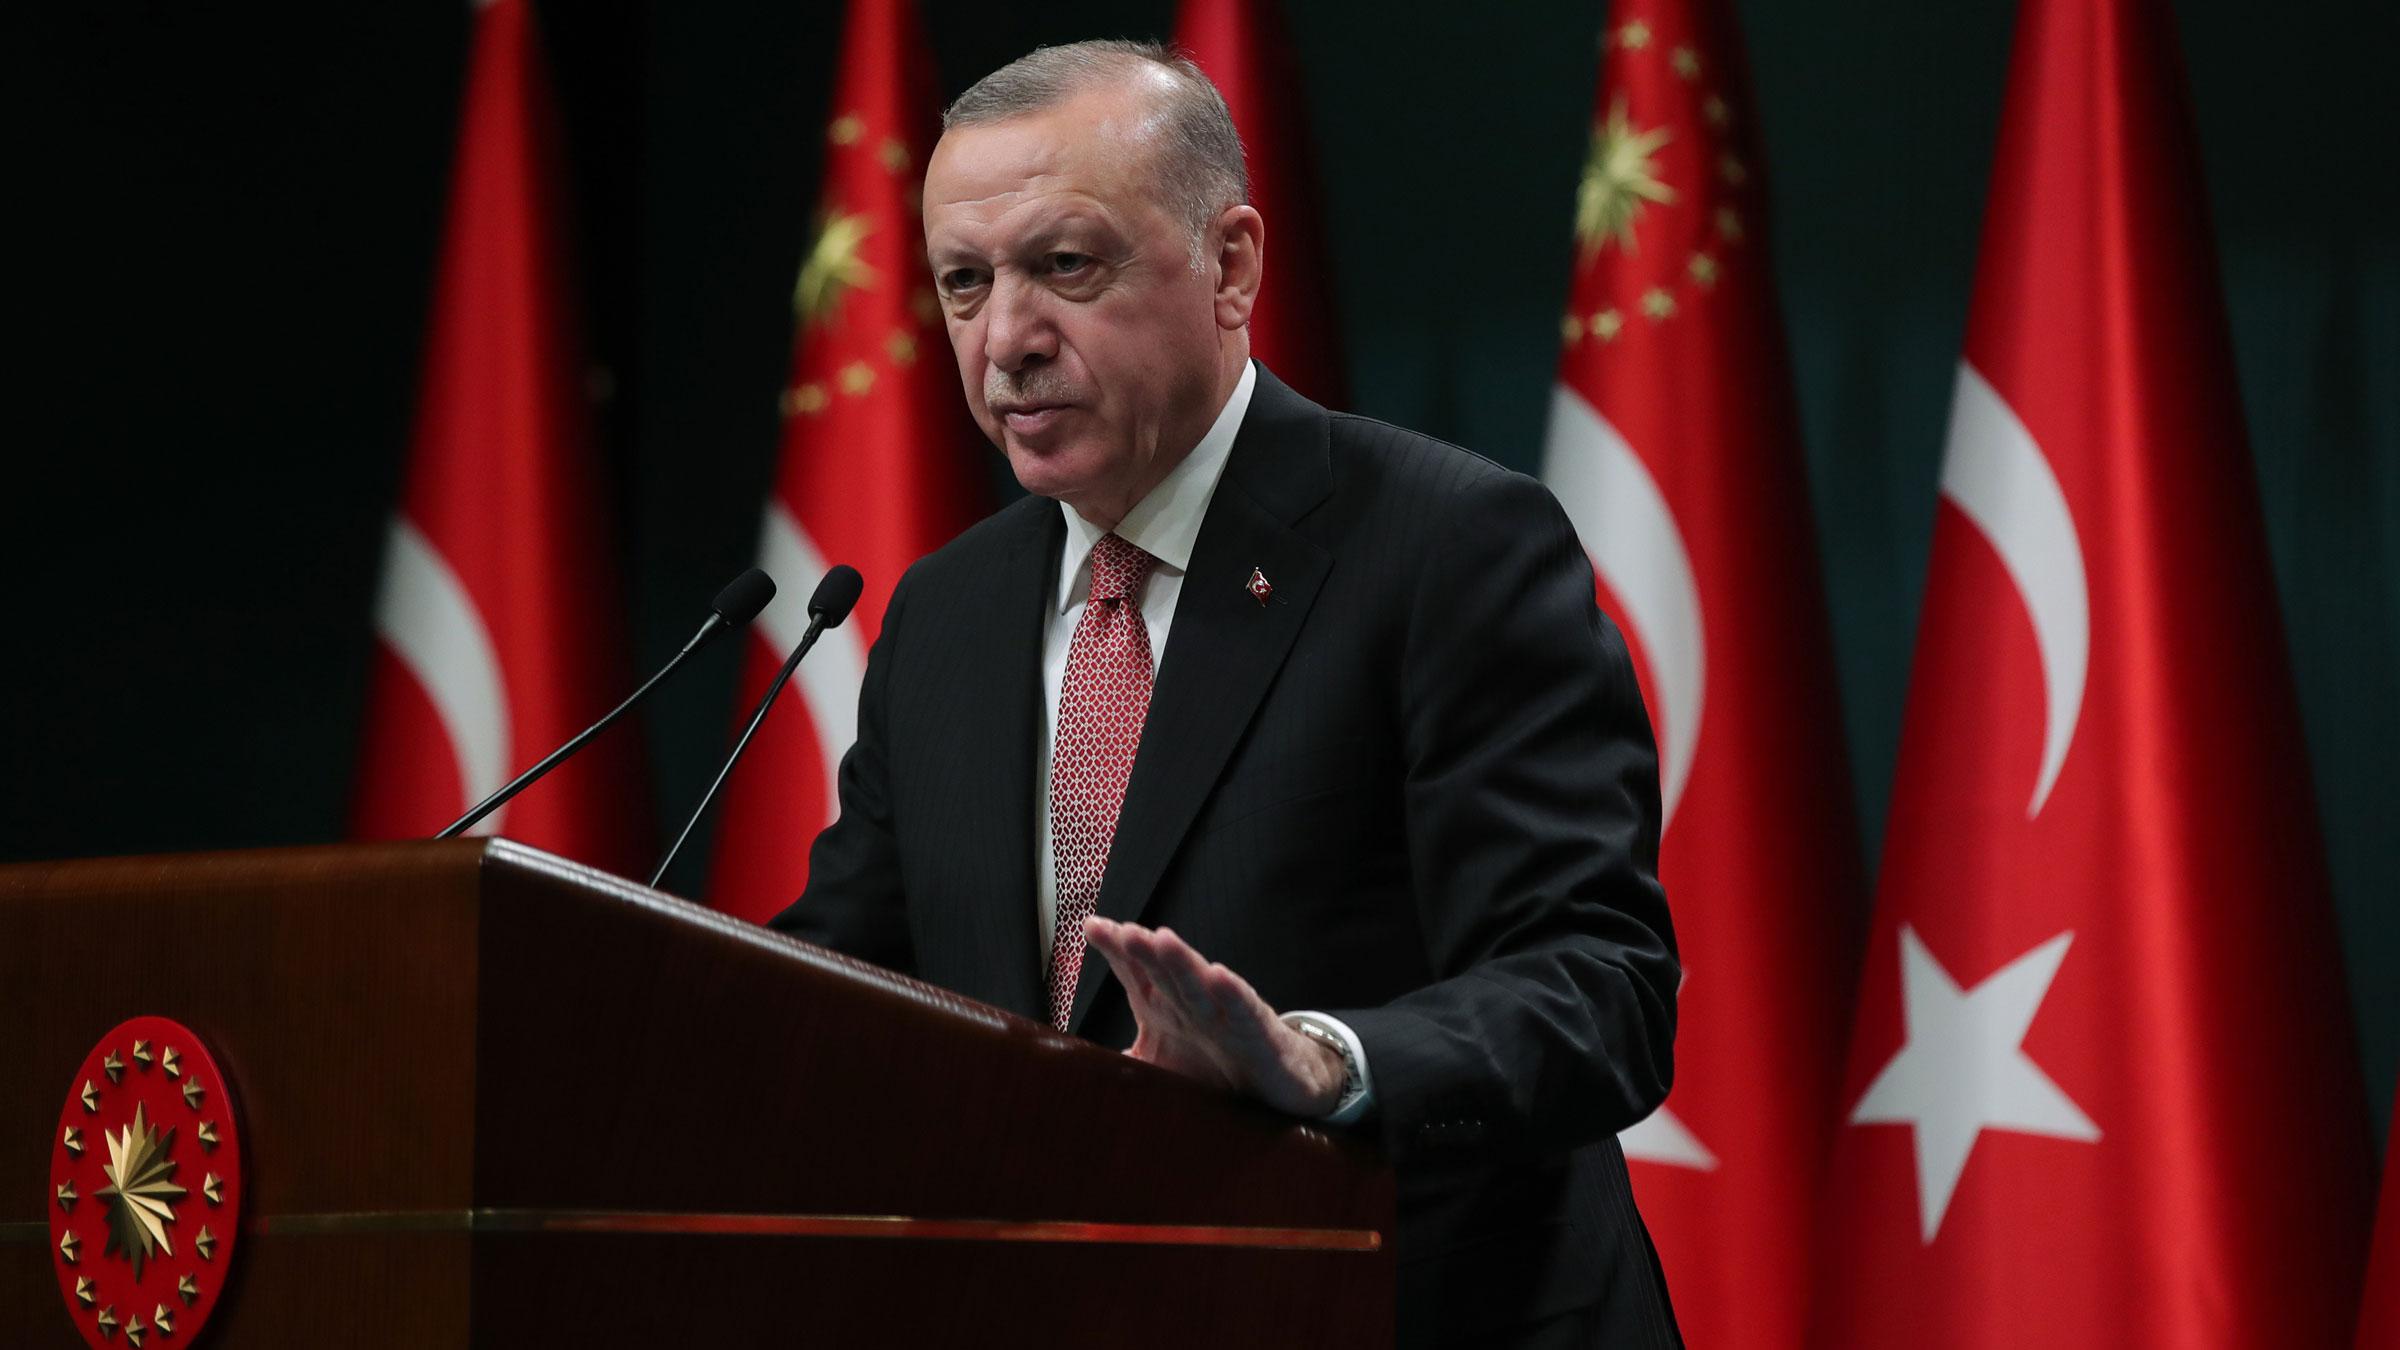 Turkish President Recep Tayyip Erdogan speaks at a news conference in Ankara, Turkey, on Monday.